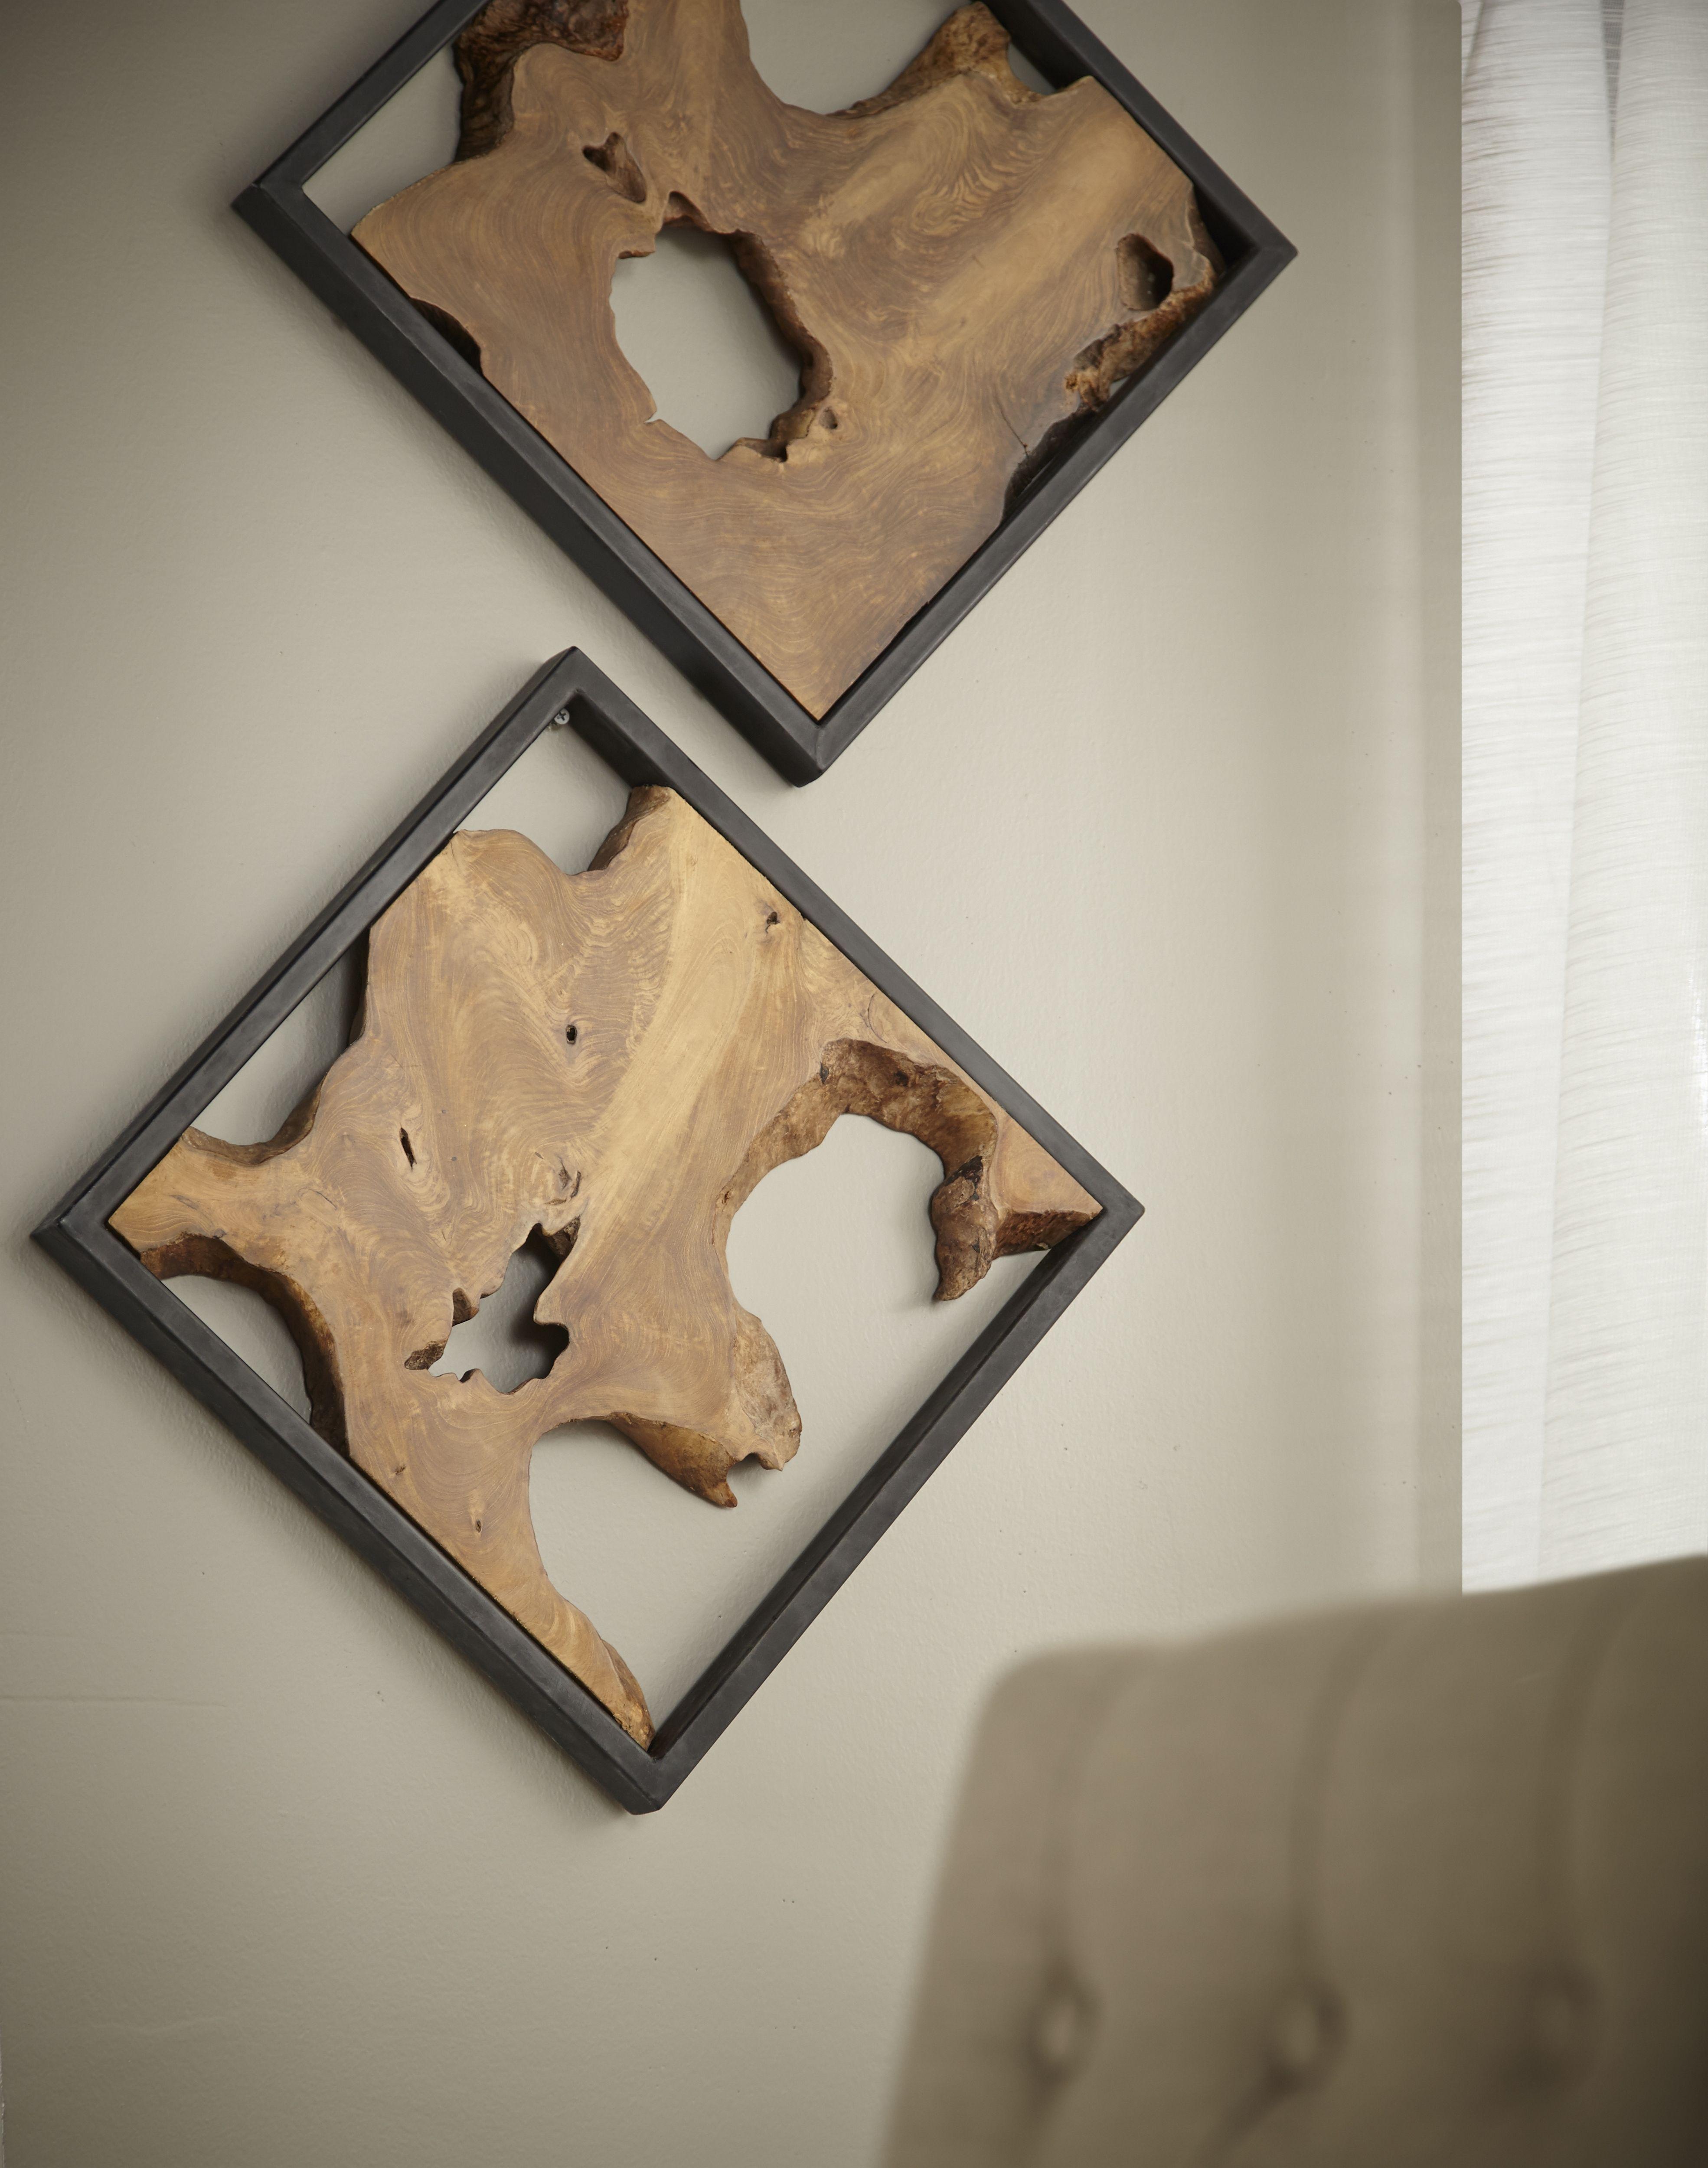 Framed Slice Wall Tile Teak Wood Black Frame Small Wood Projects Wood Projects Diy Wood Projects